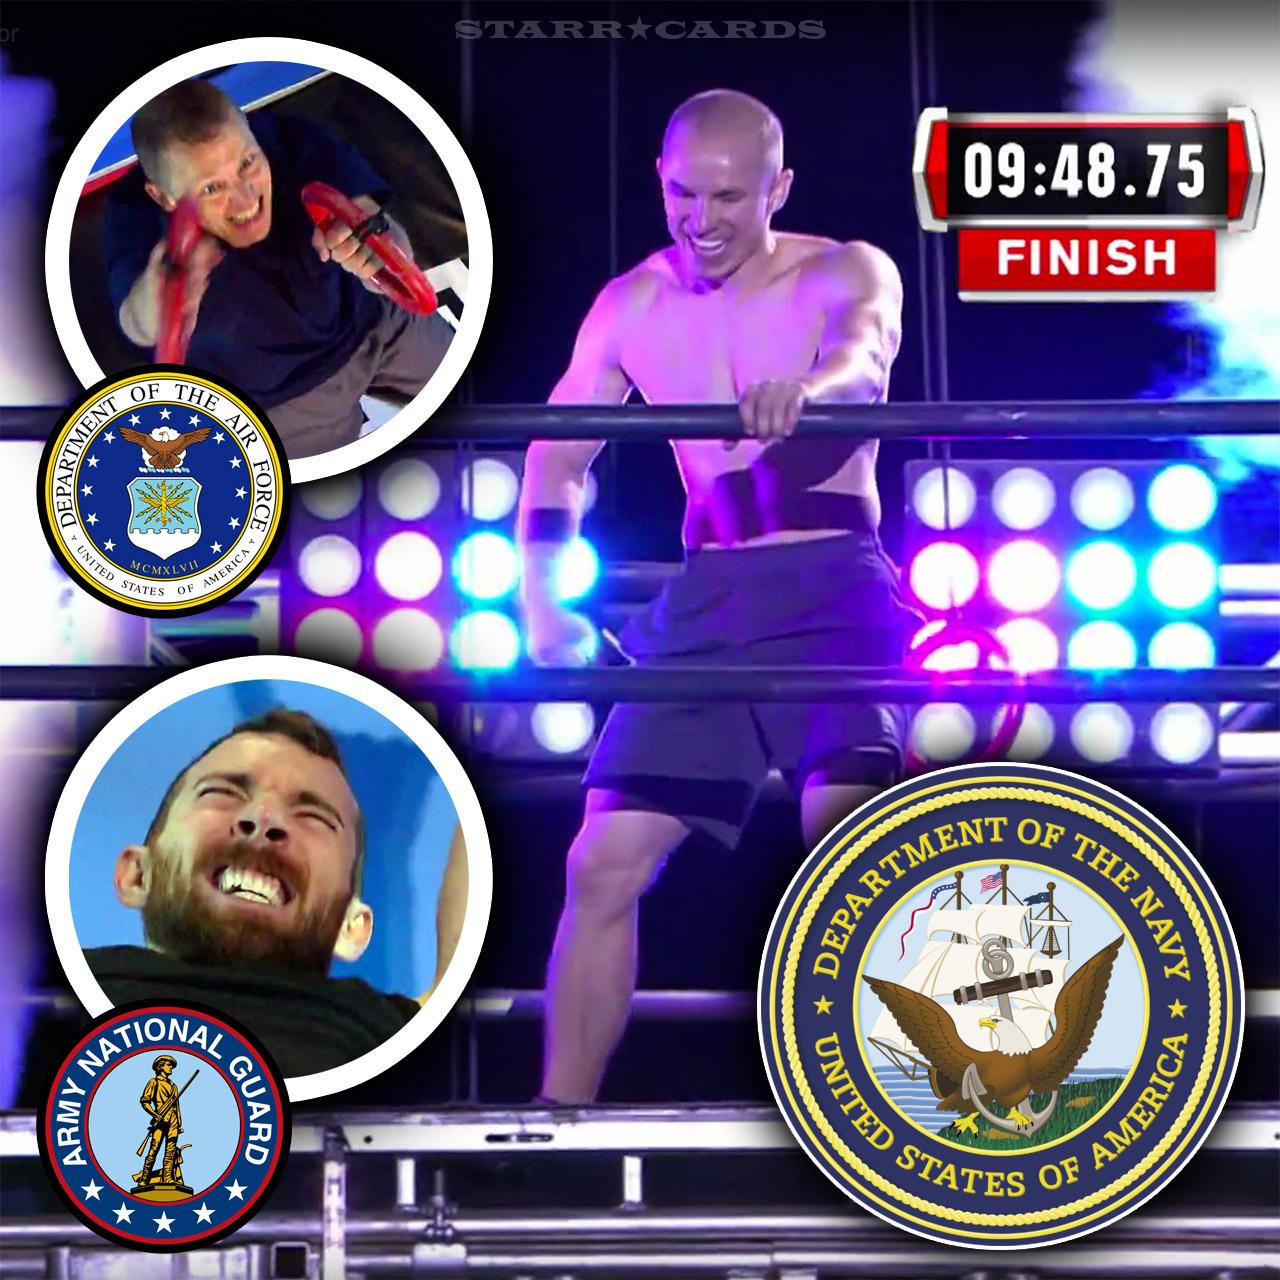 Dustin McKinney, Matthew Jensen, and Ryan Stratis on 'American Ninja Warrior' Military Finals